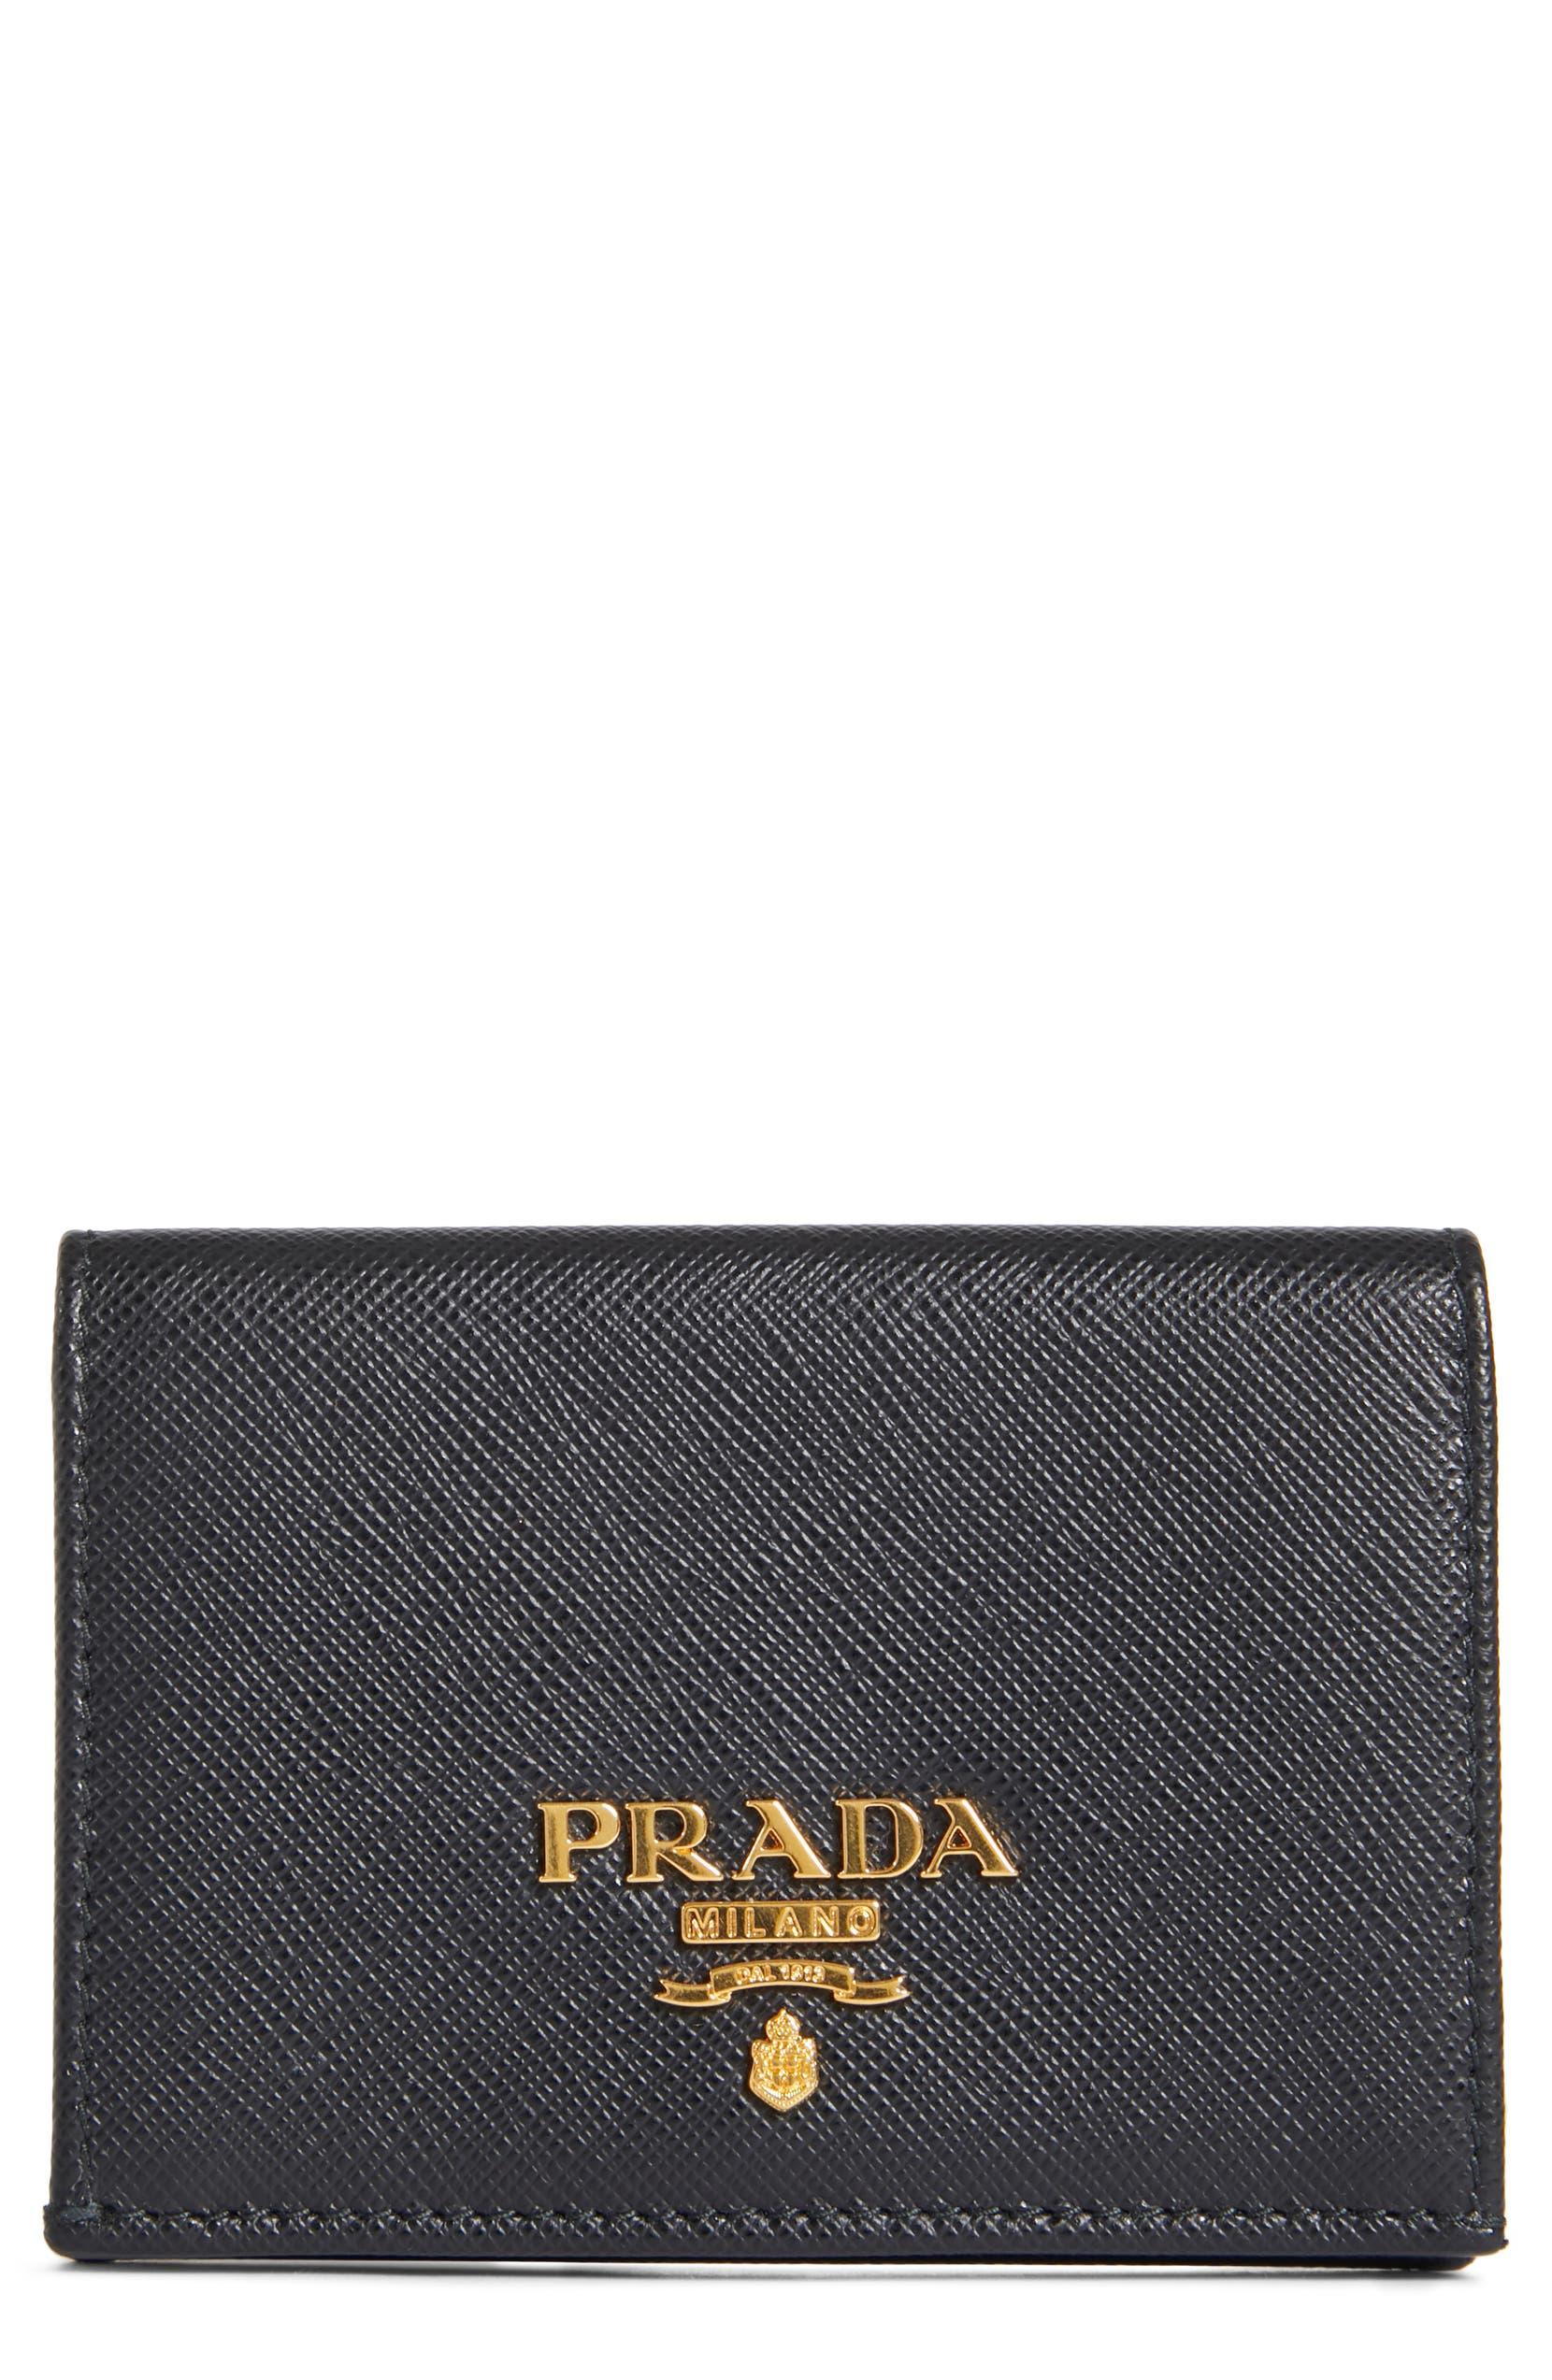 4c41ca519fb1 Prada Saffiano Leather French Wallet